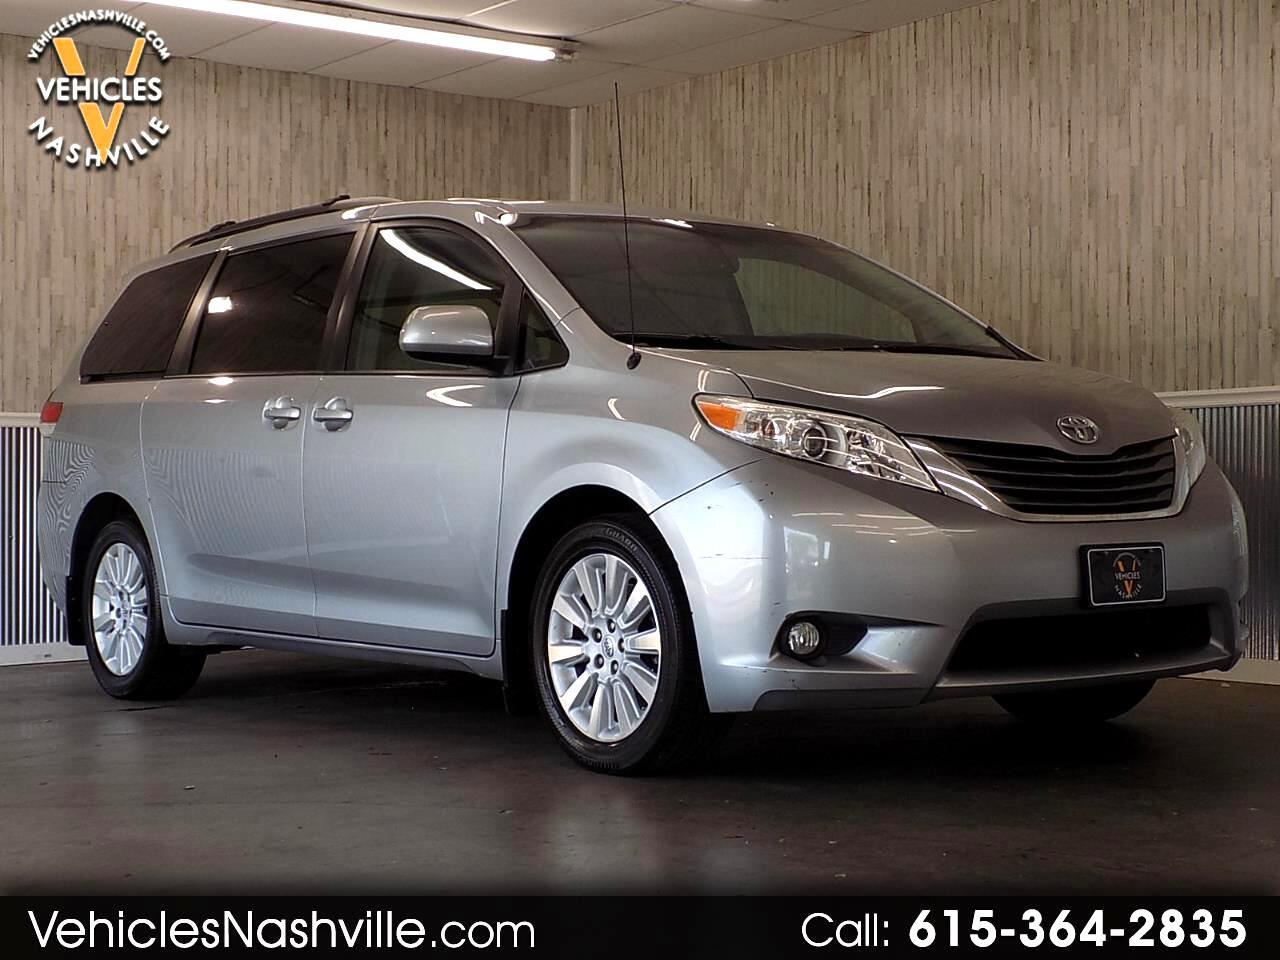 2013 Toyota Sienna XLE 7-Passenger AWD